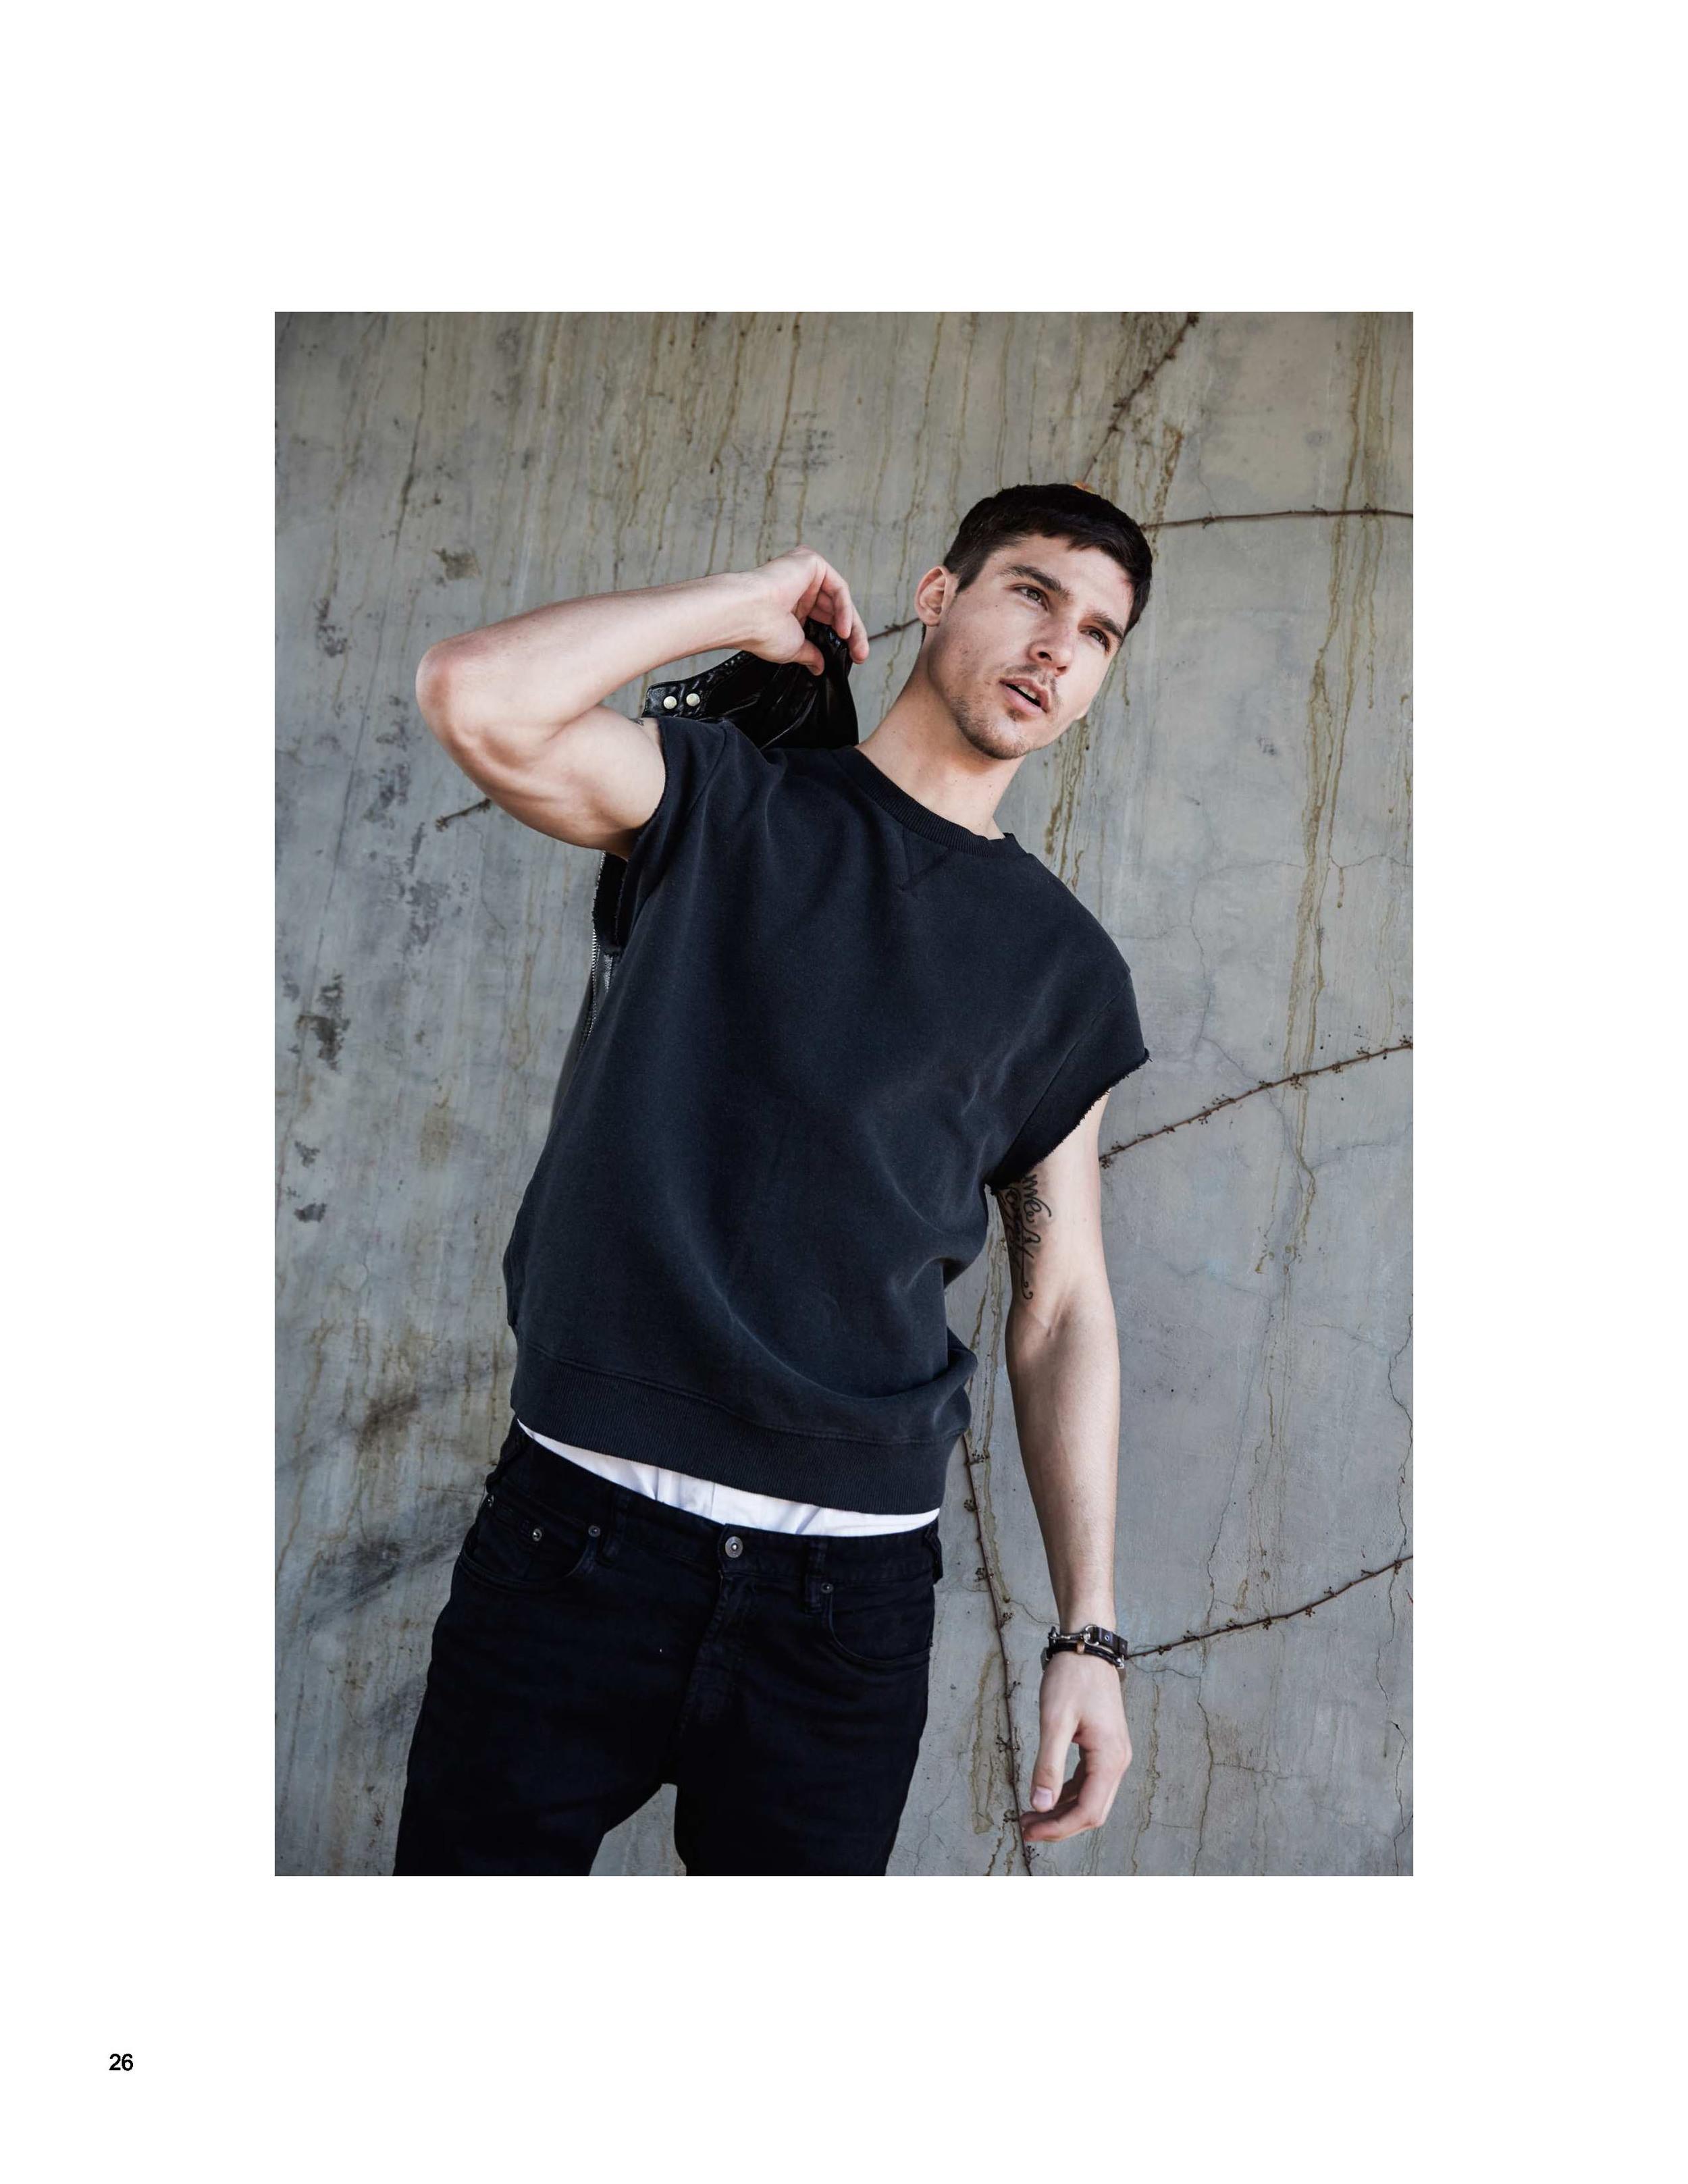 Chris_Petersen_NUDEMagazineIssue3_LA-Models_5.jpg